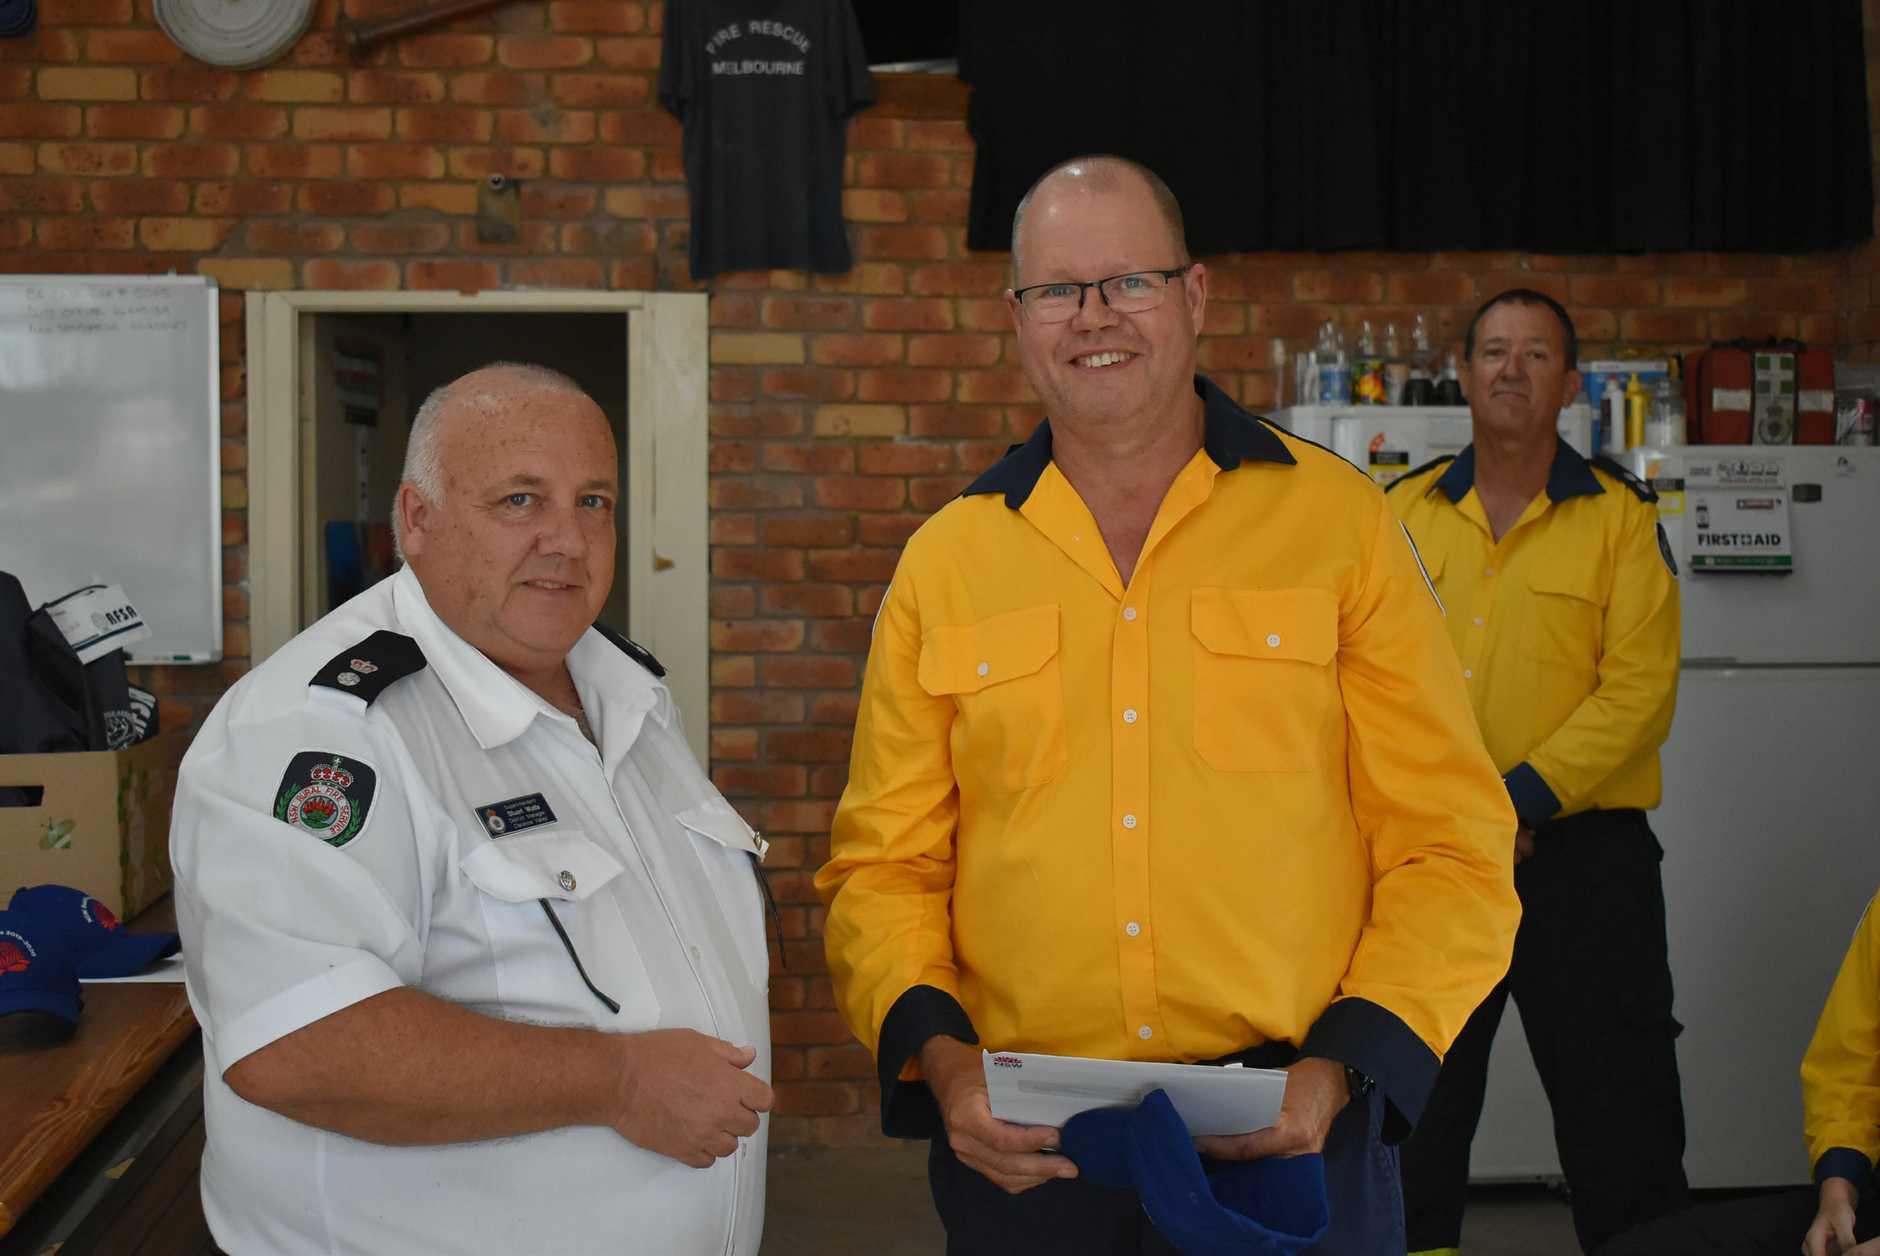 Lawrence RFS deputy captain Paul Simpson receiving a citation award for his work during the 2019-20 bushfire season.